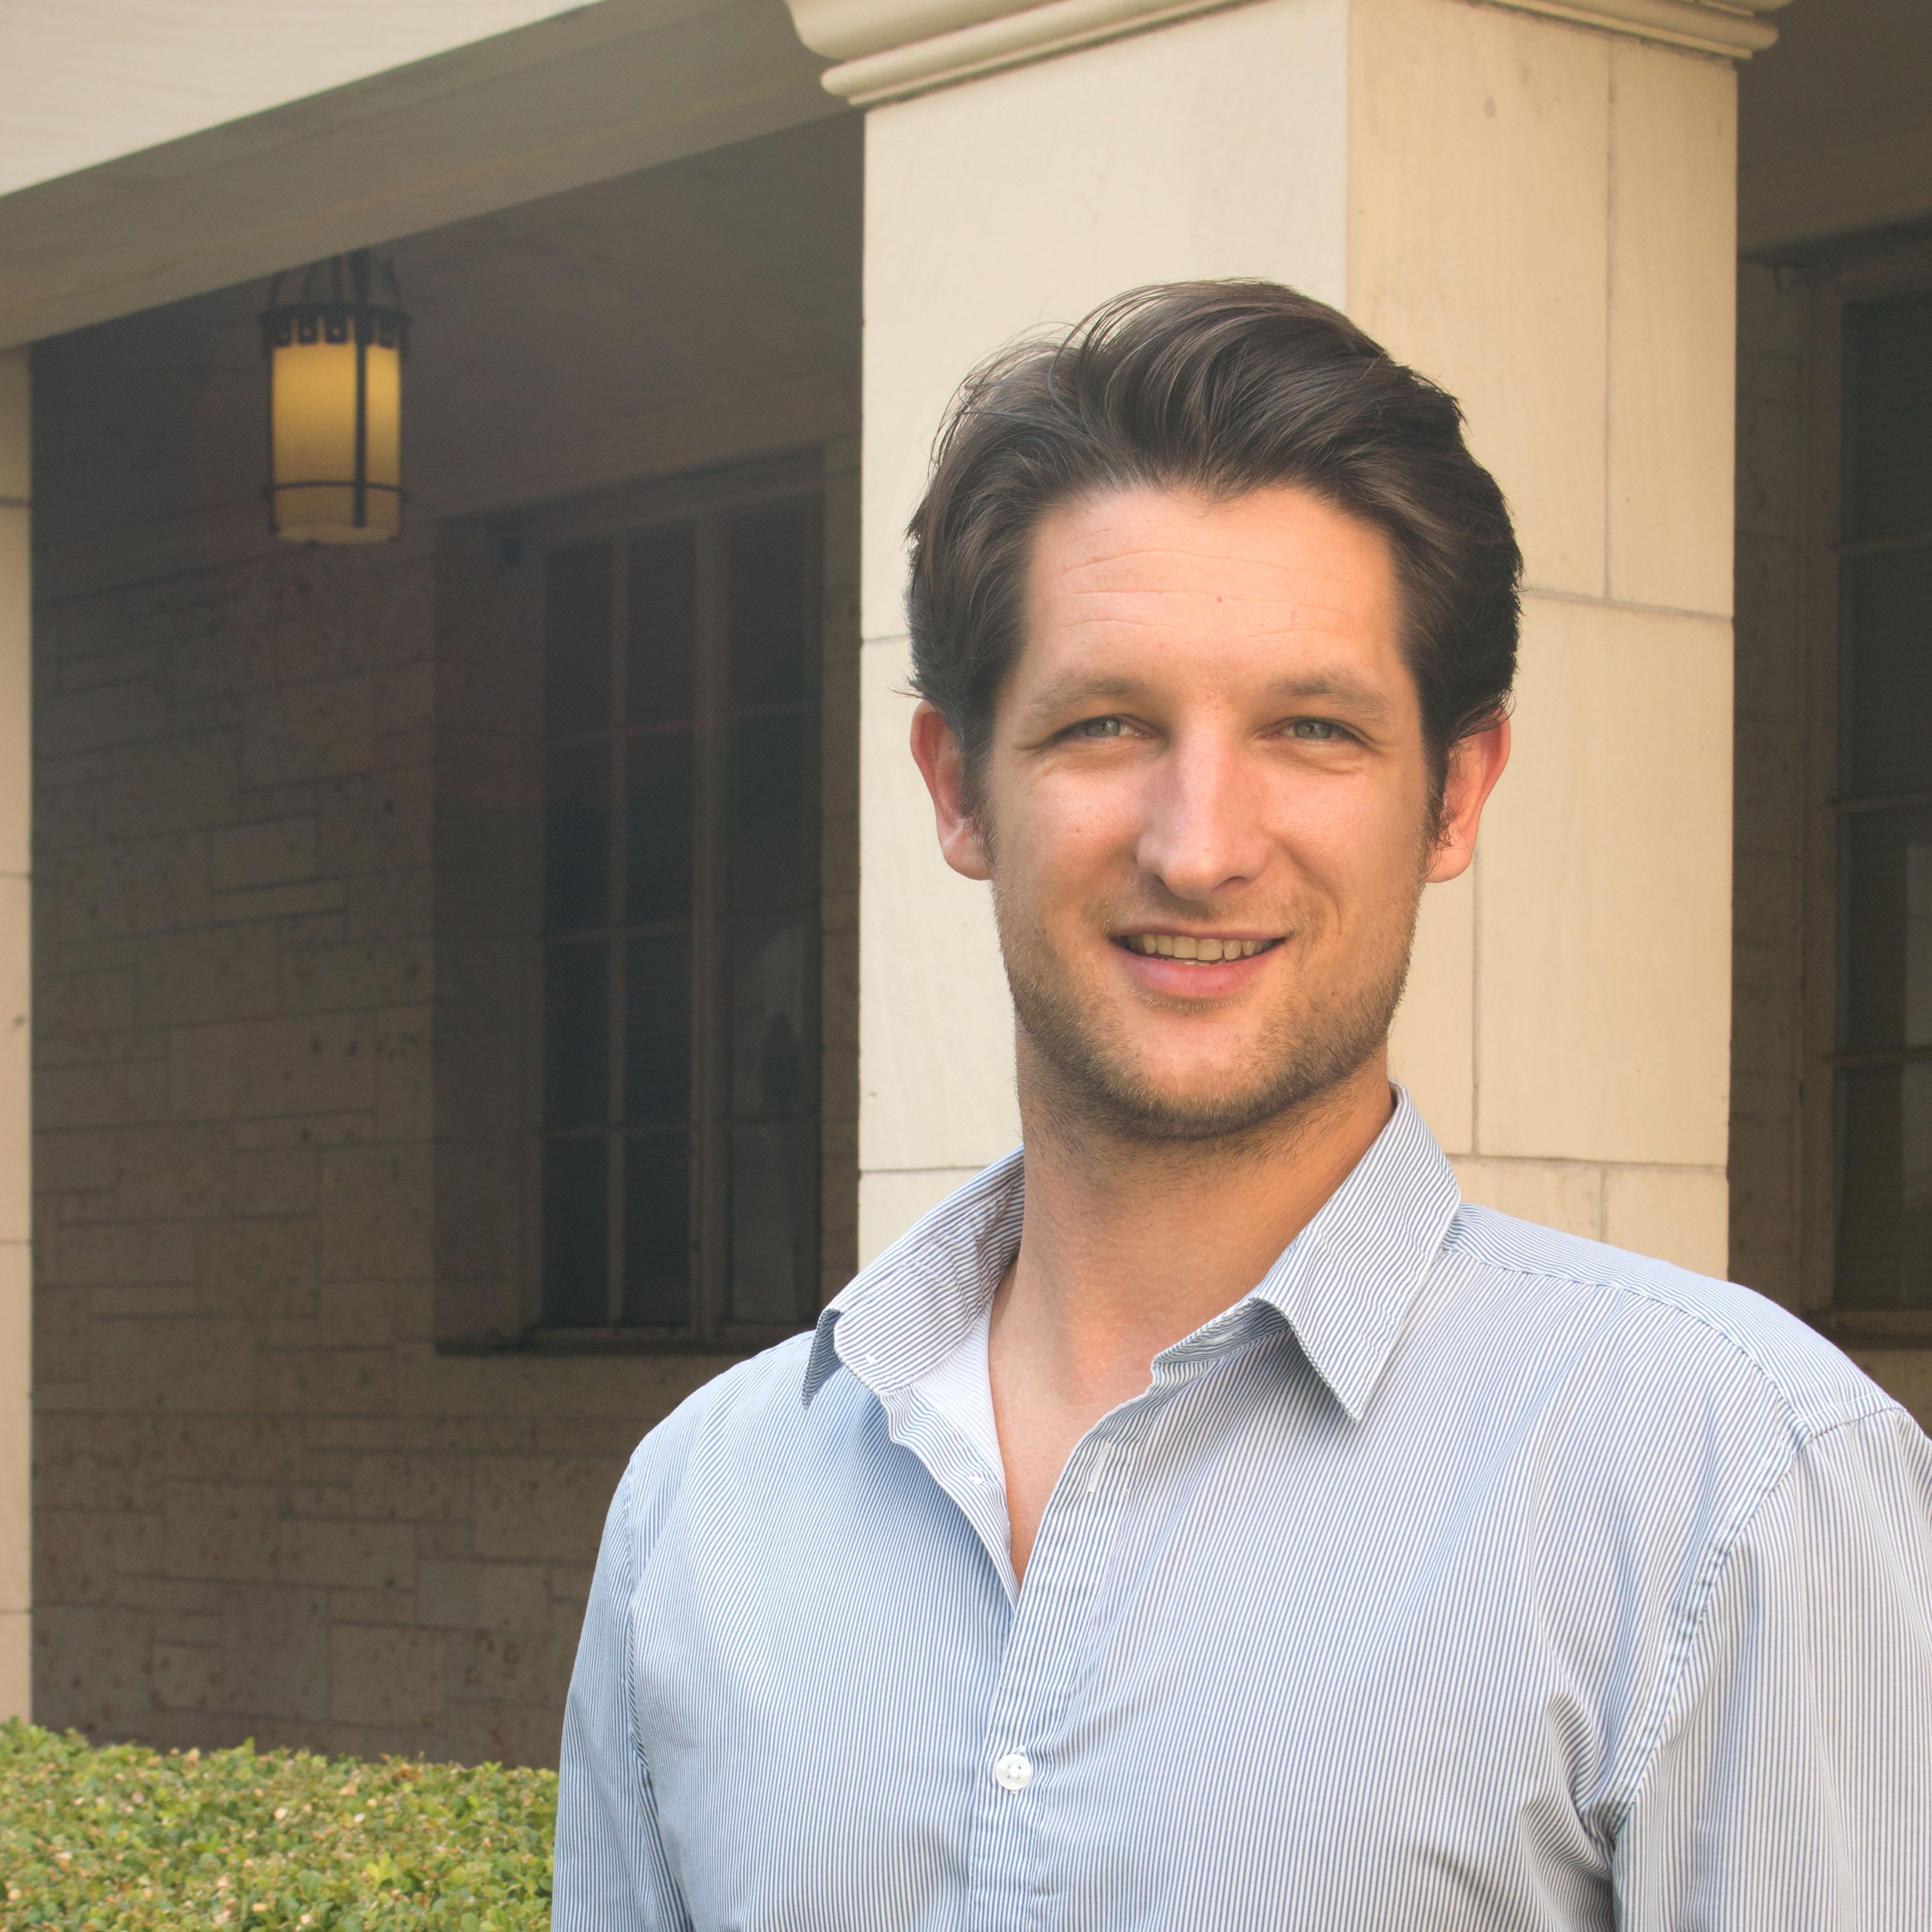 Headshot of DWRL staff member Reinhard Mueller